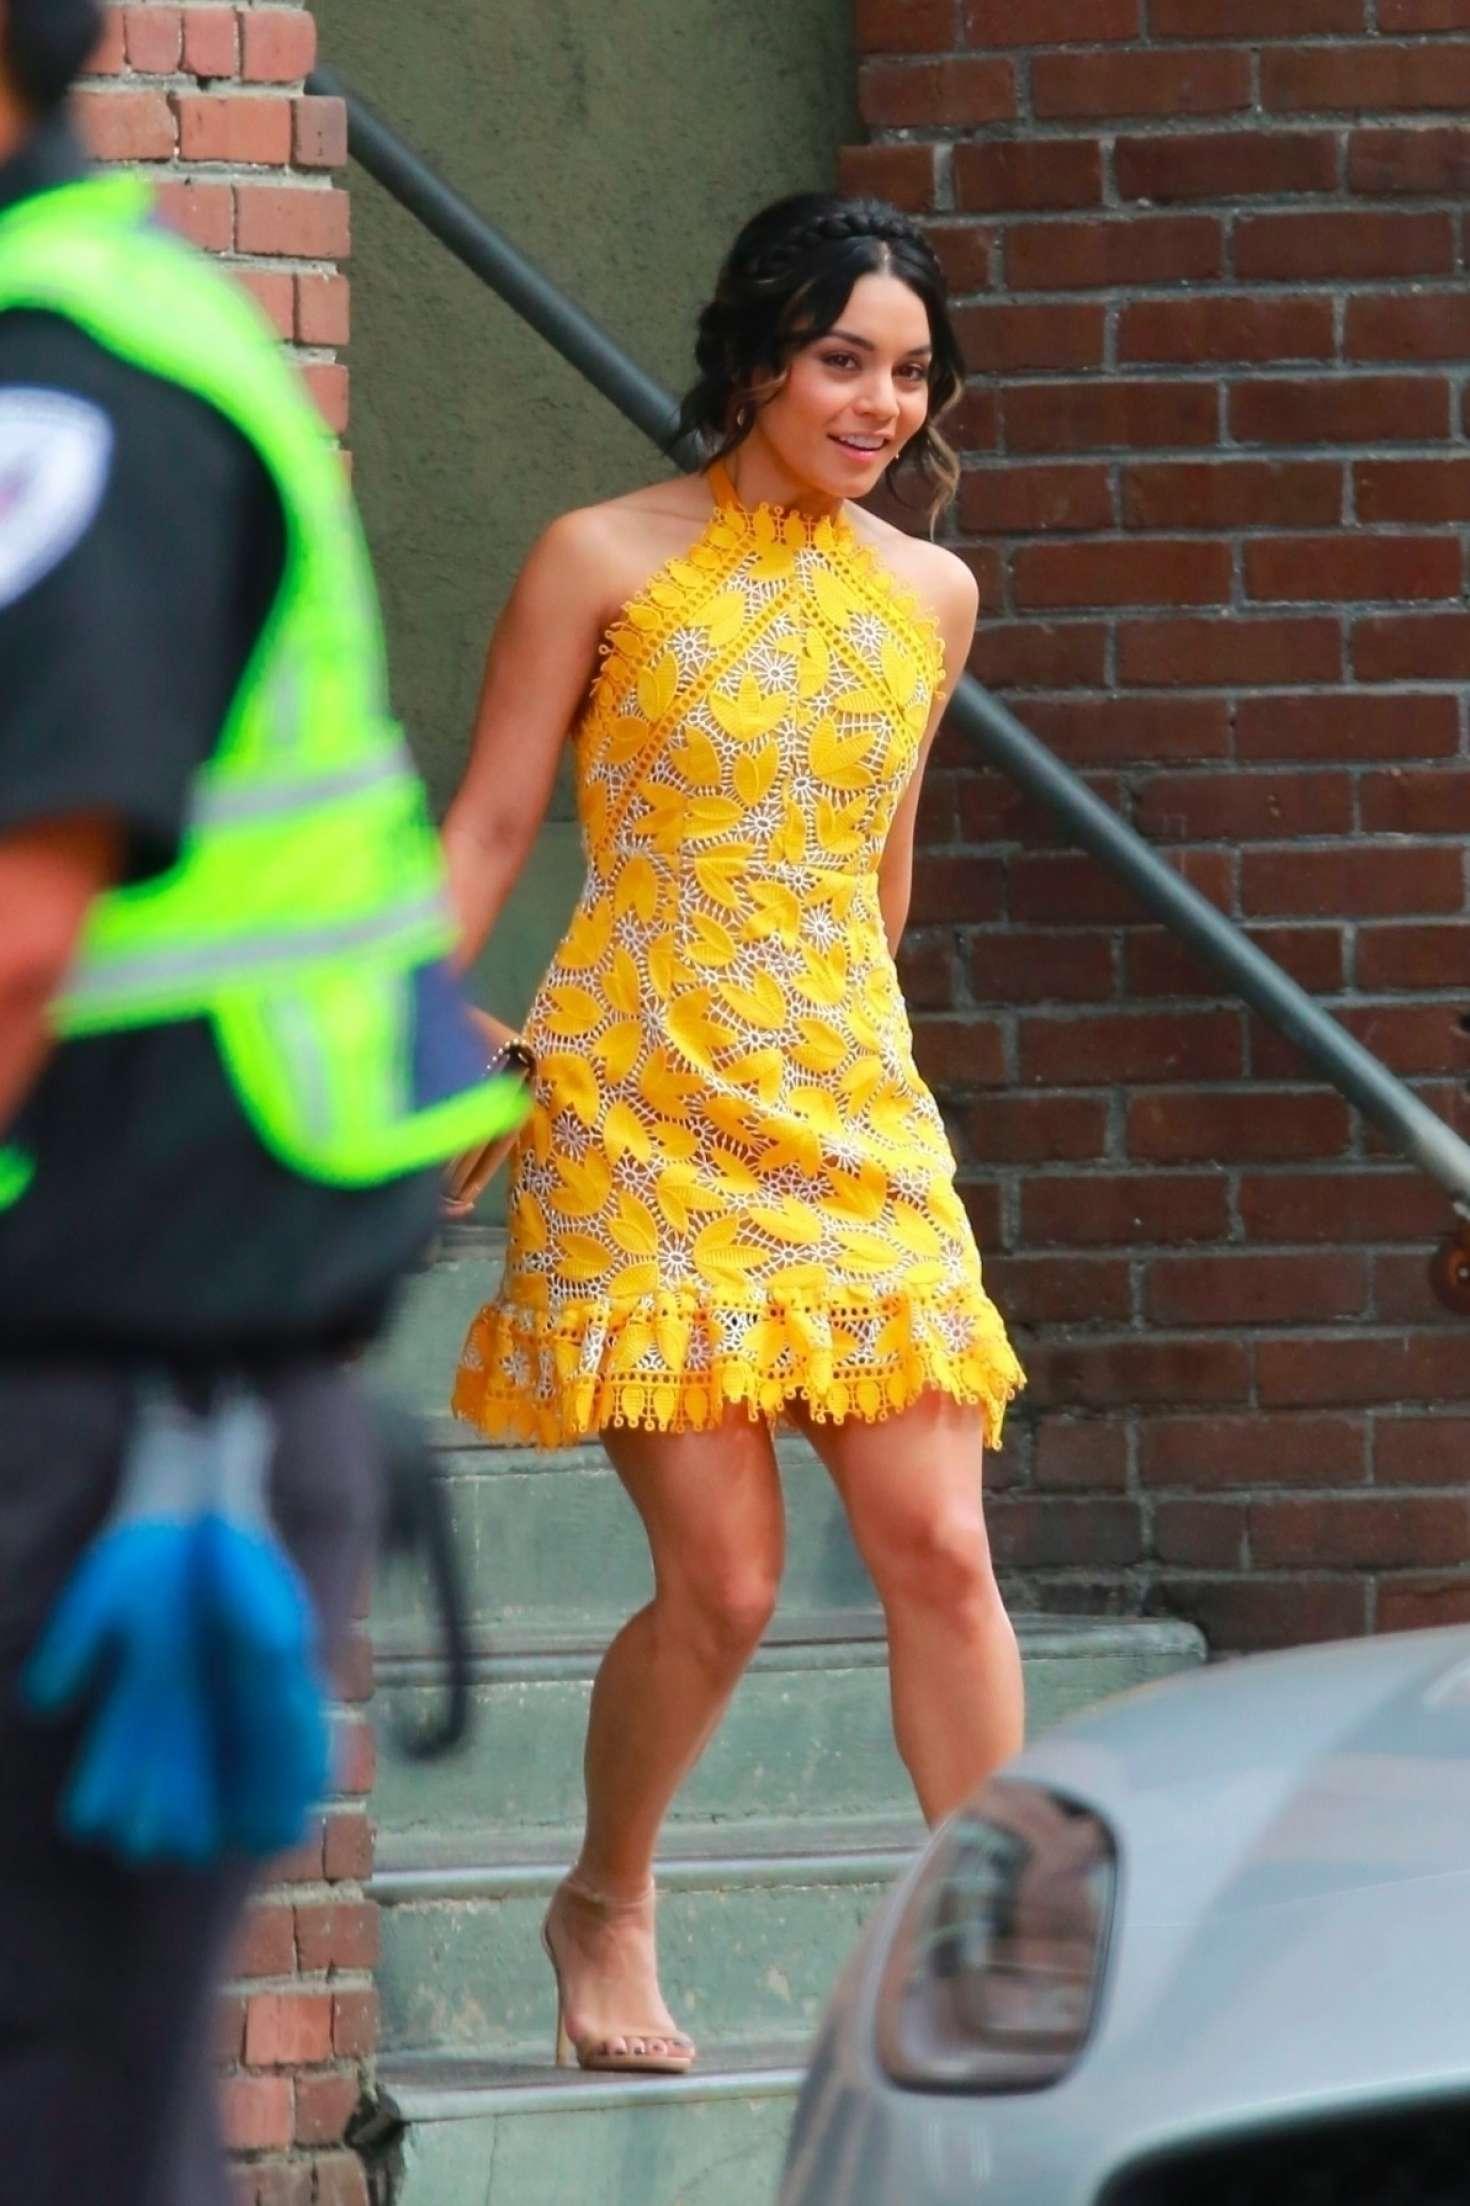 Vanessa Hudgens 2017 : Vanessa Hudgens gin Yellow Mini Dress Filming Dog Days -19